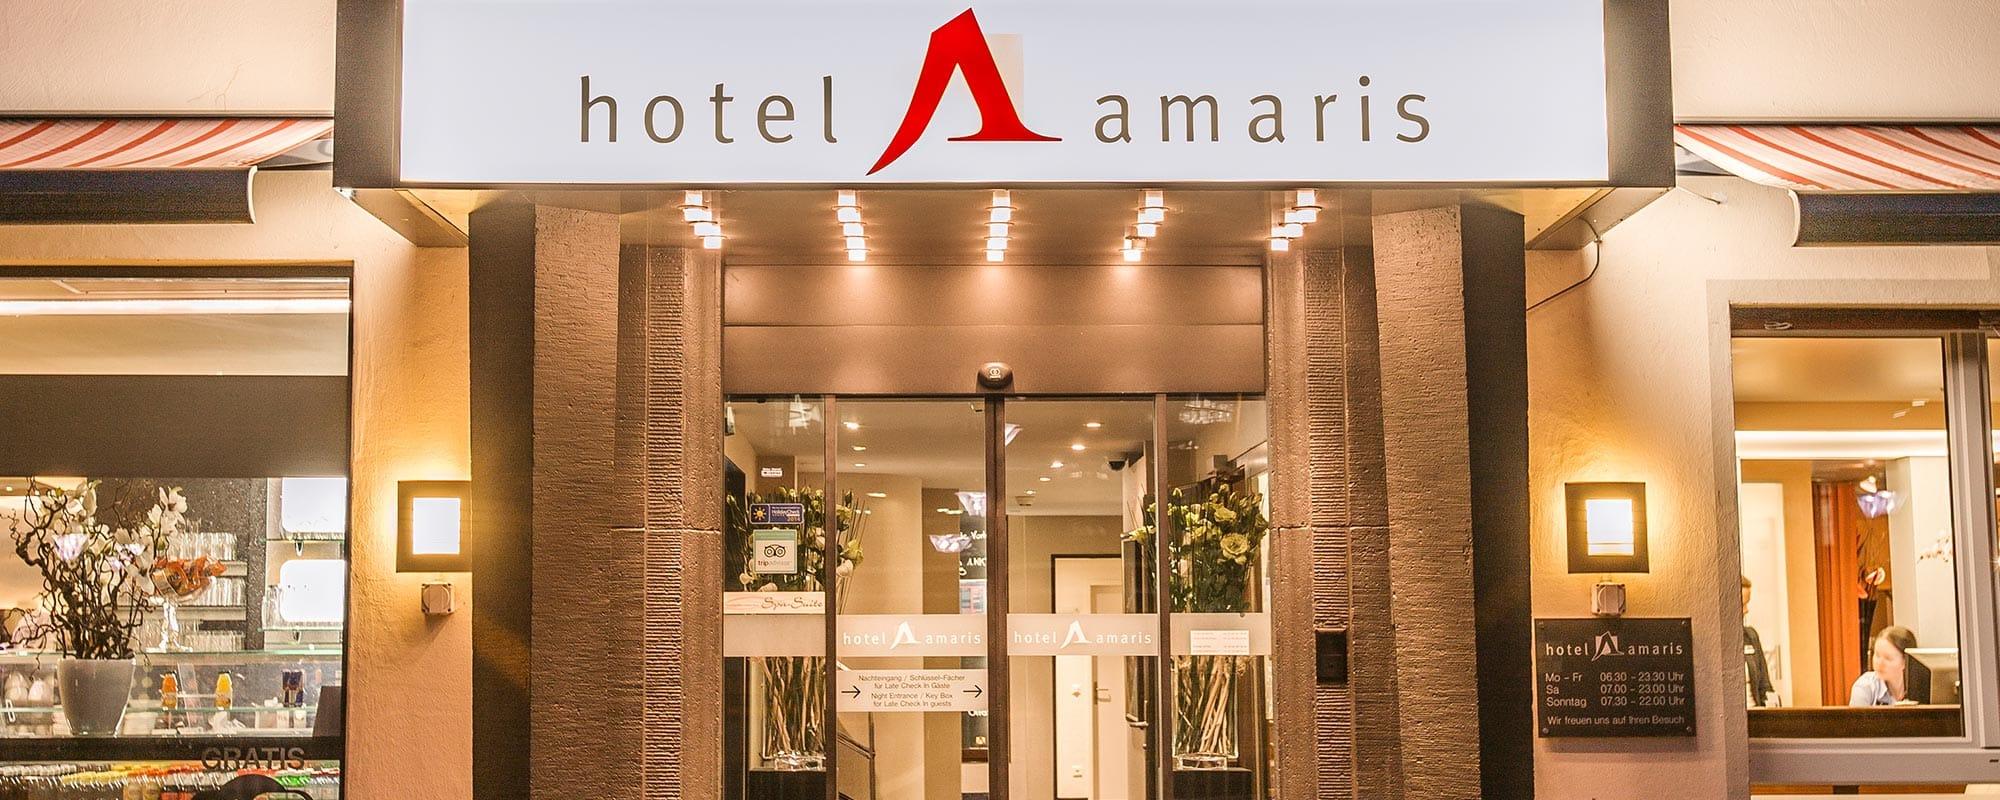 Hotel-Amaris -front-reception